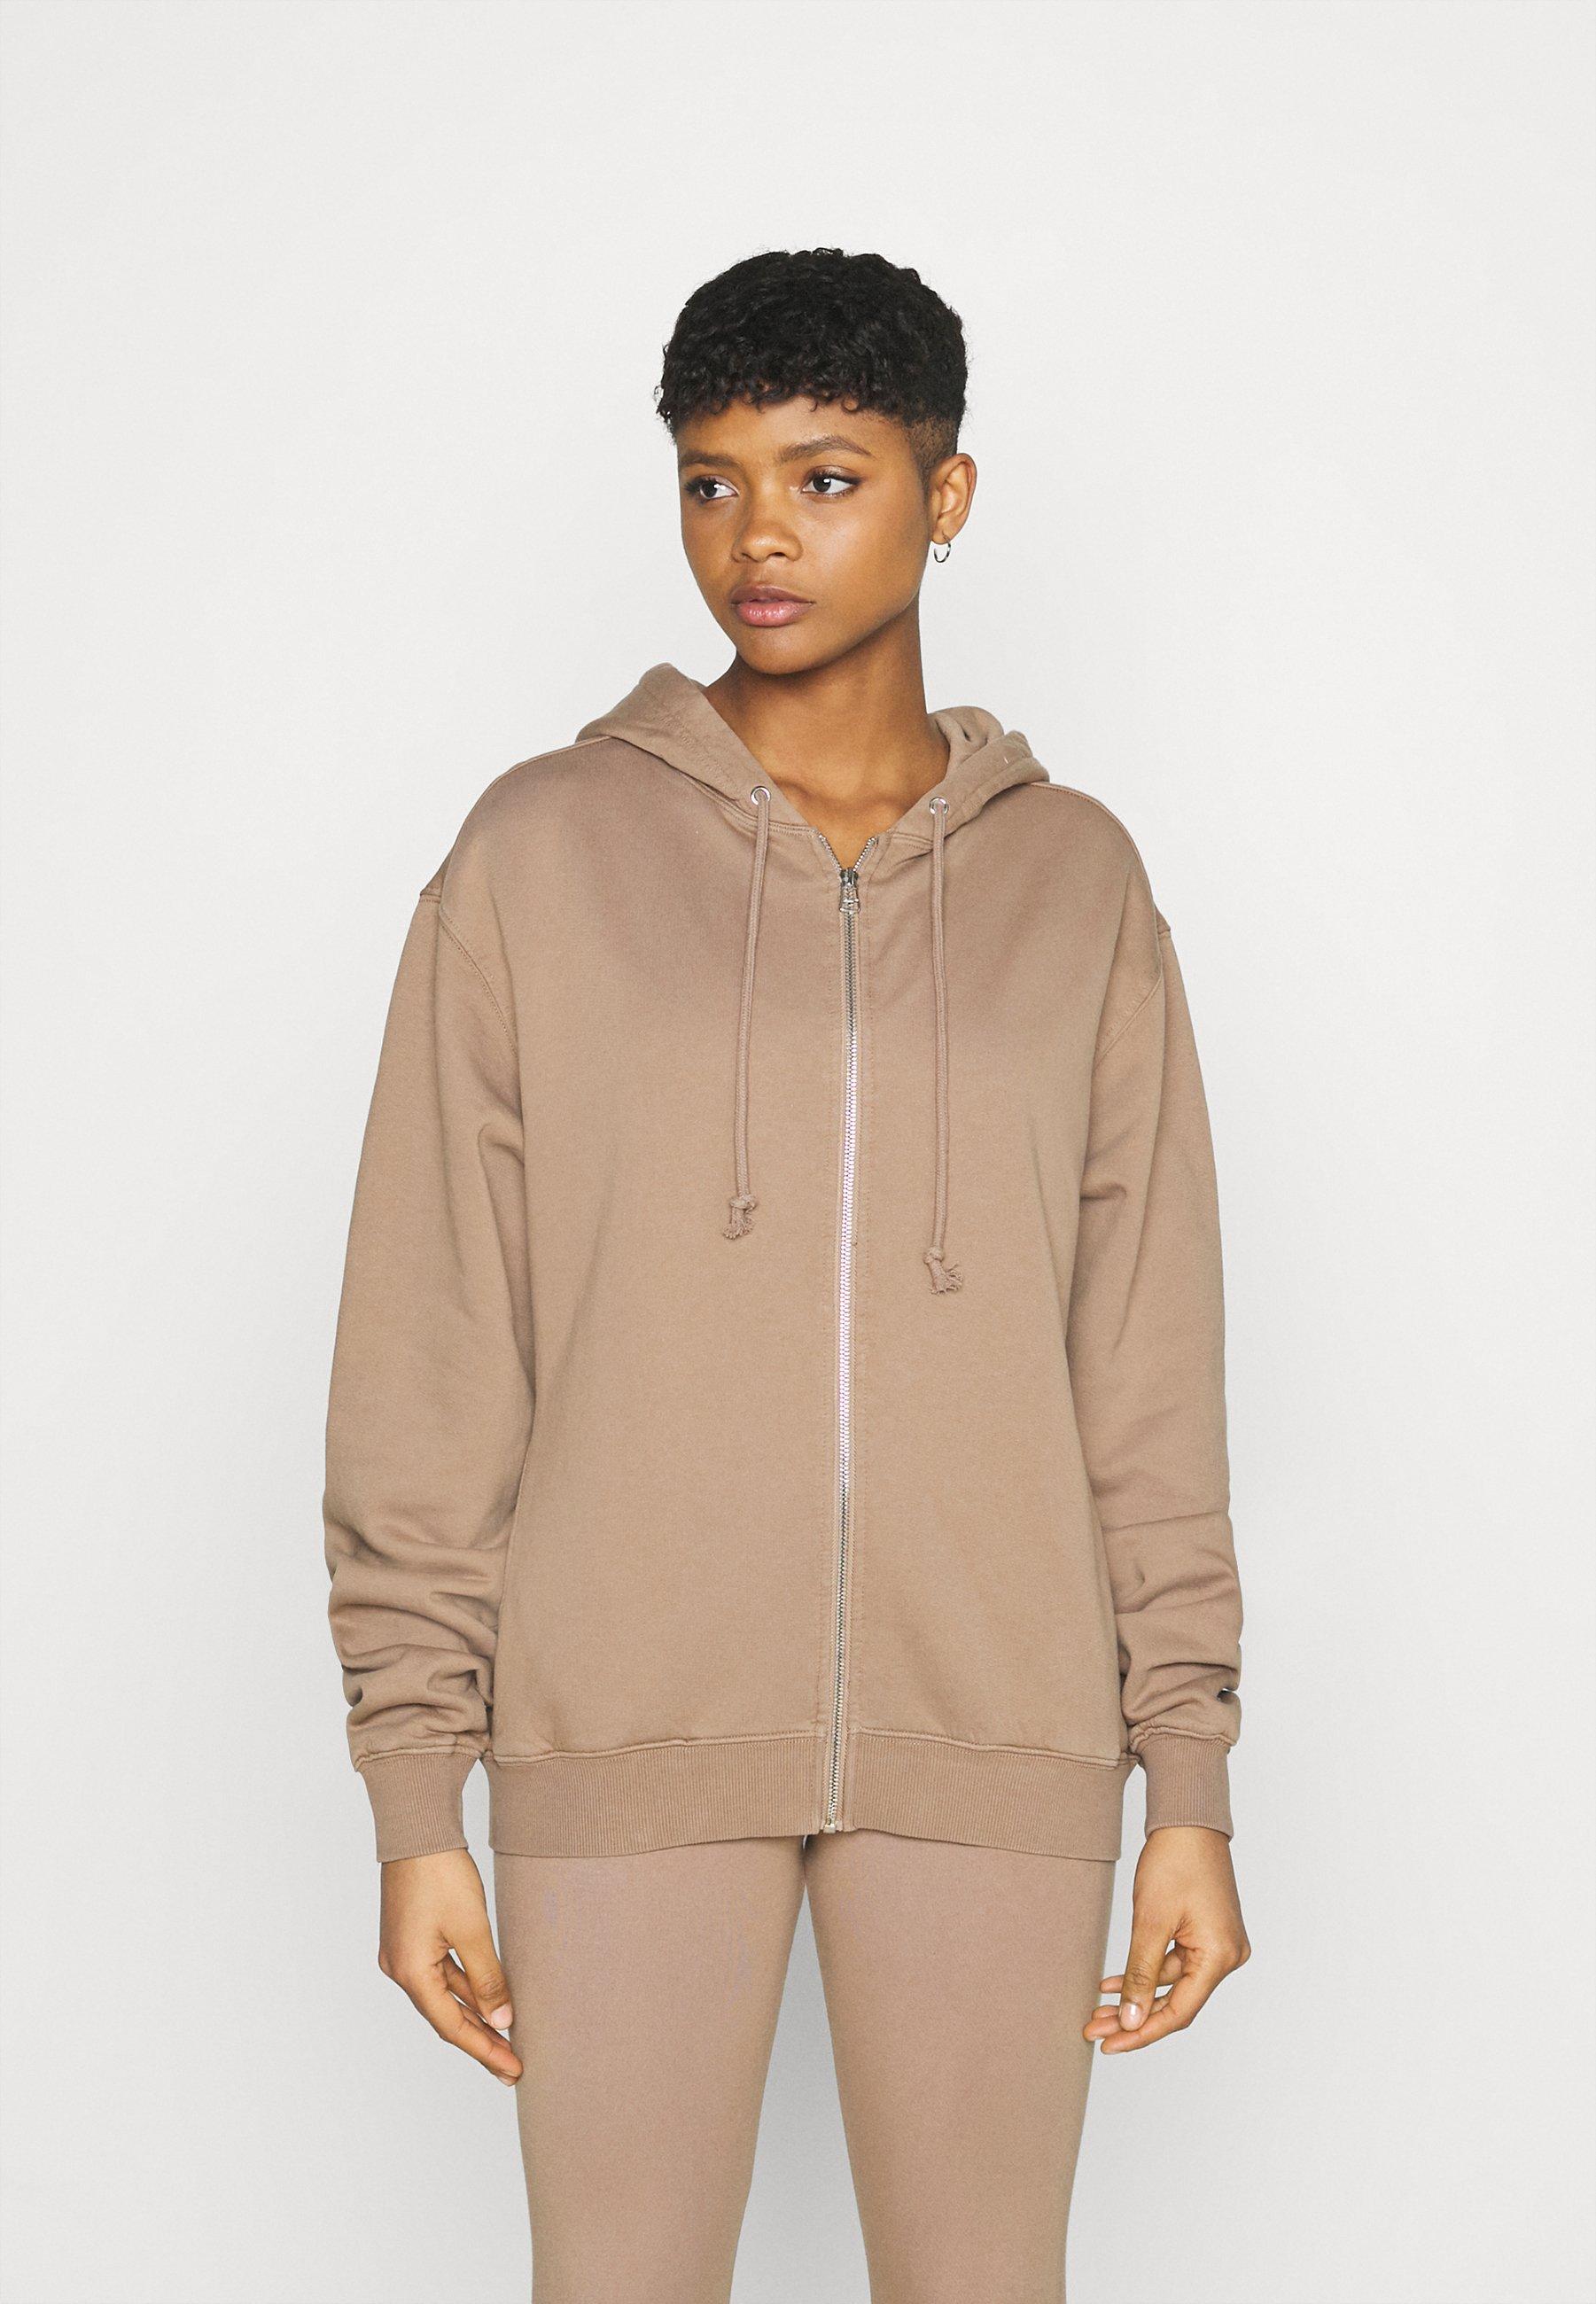 Femme BOYFRIEND ZIP HOODIE - Sweat à capuche zippé